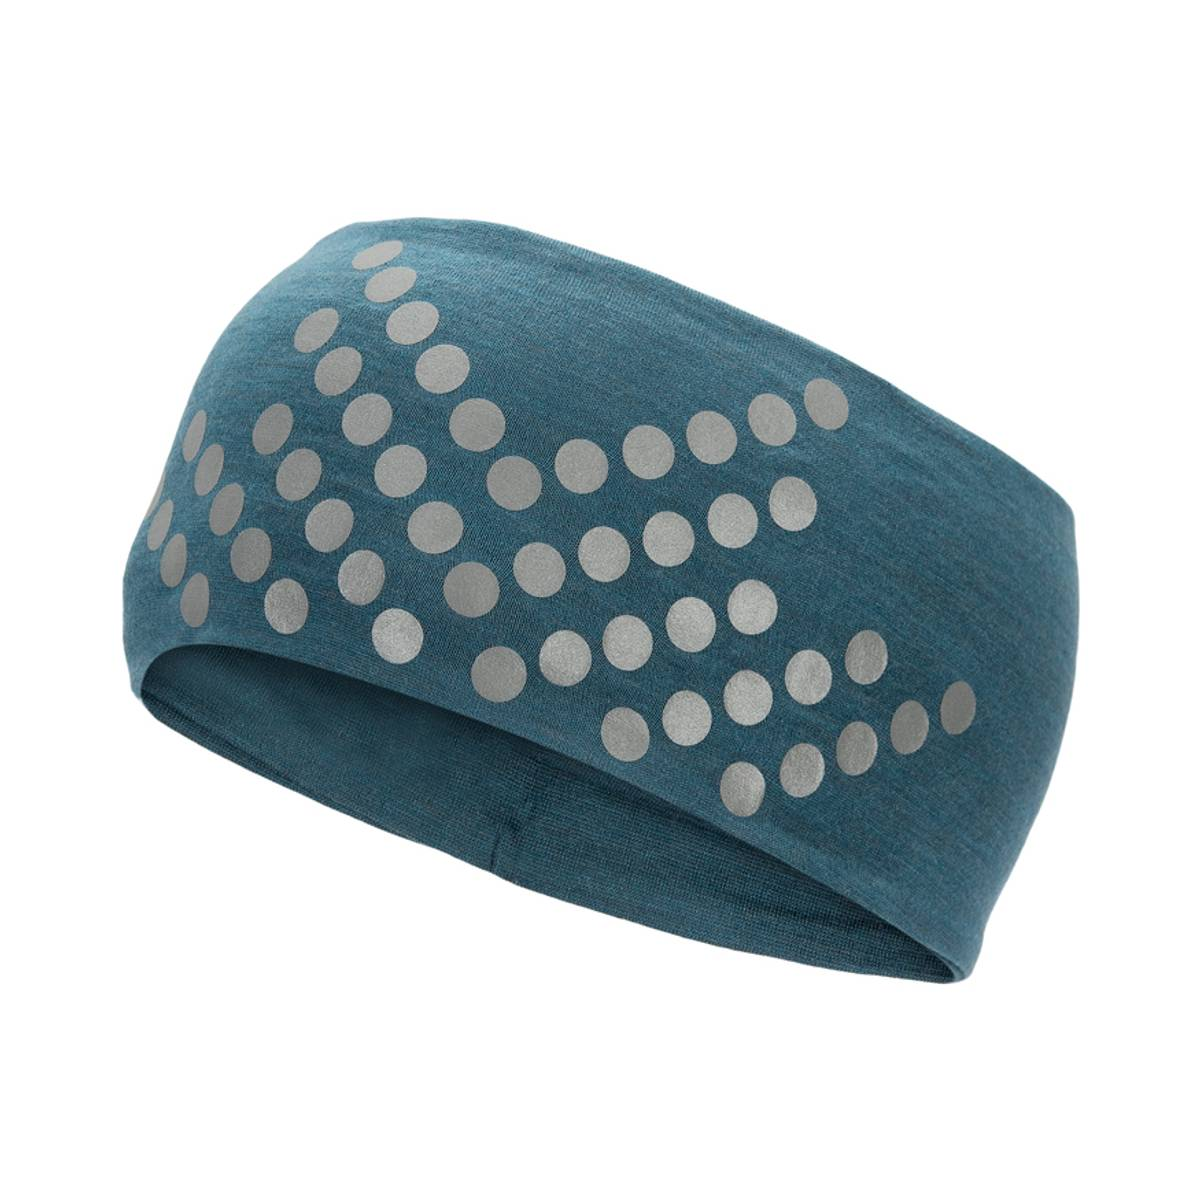 Morild Sølvfaks pannebånd med refleks, midnattsblå